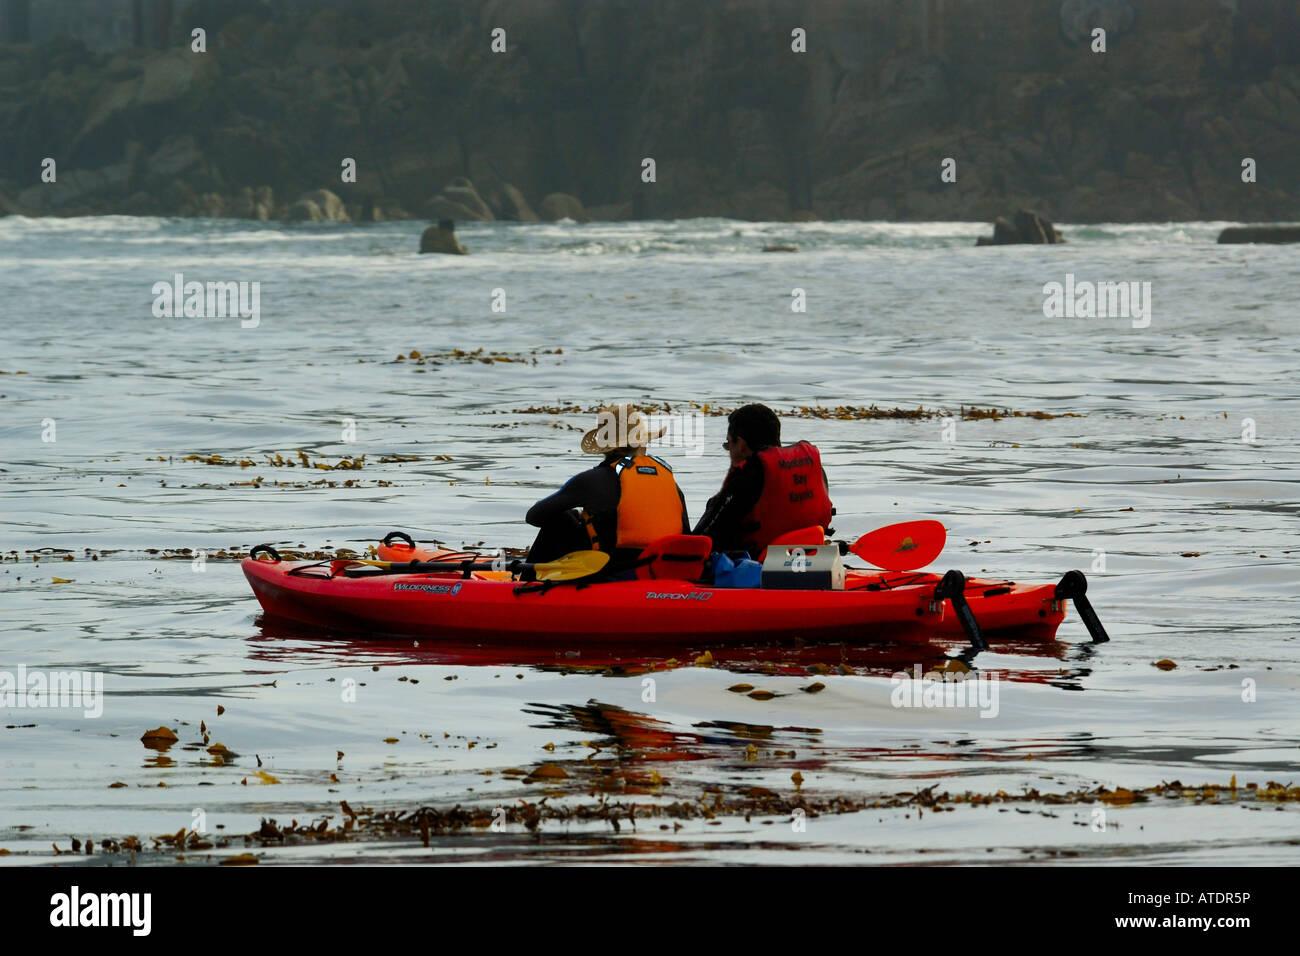 Sea kayaking in Monterey National Marine Sanctuary Monterey California Pacific Ocean - Stock Image